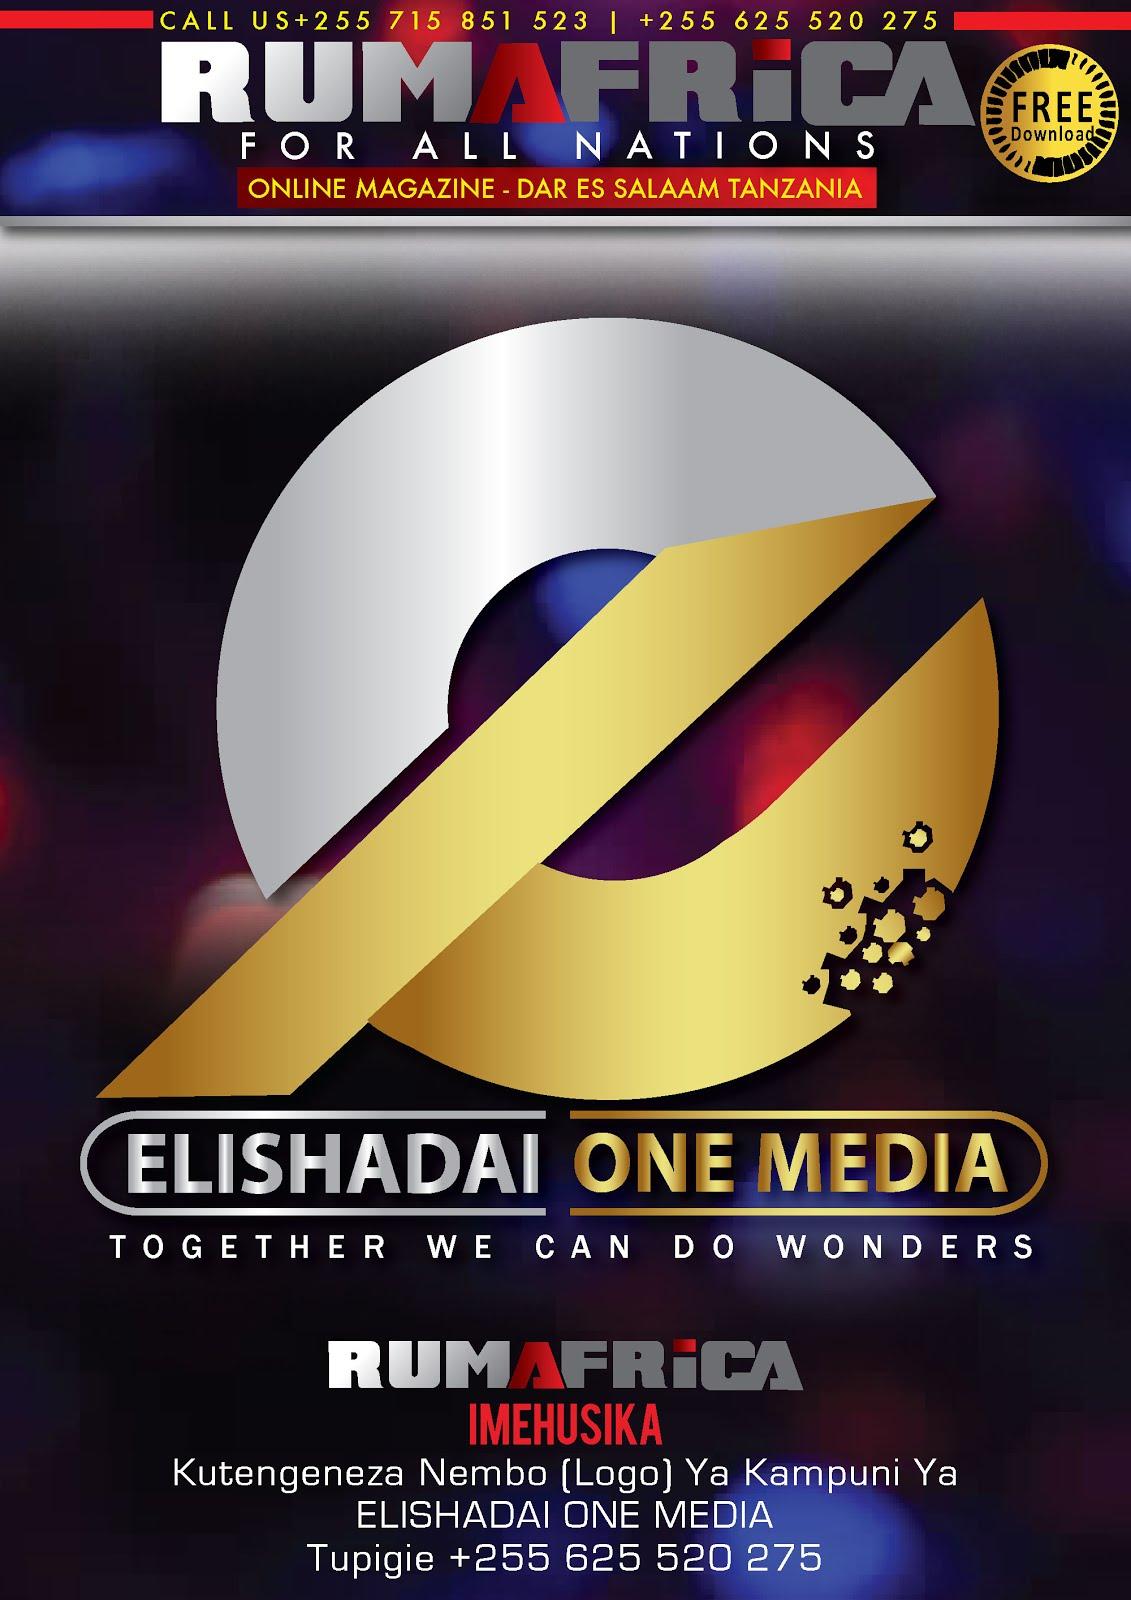 ELISHADAI ONE MEDIA